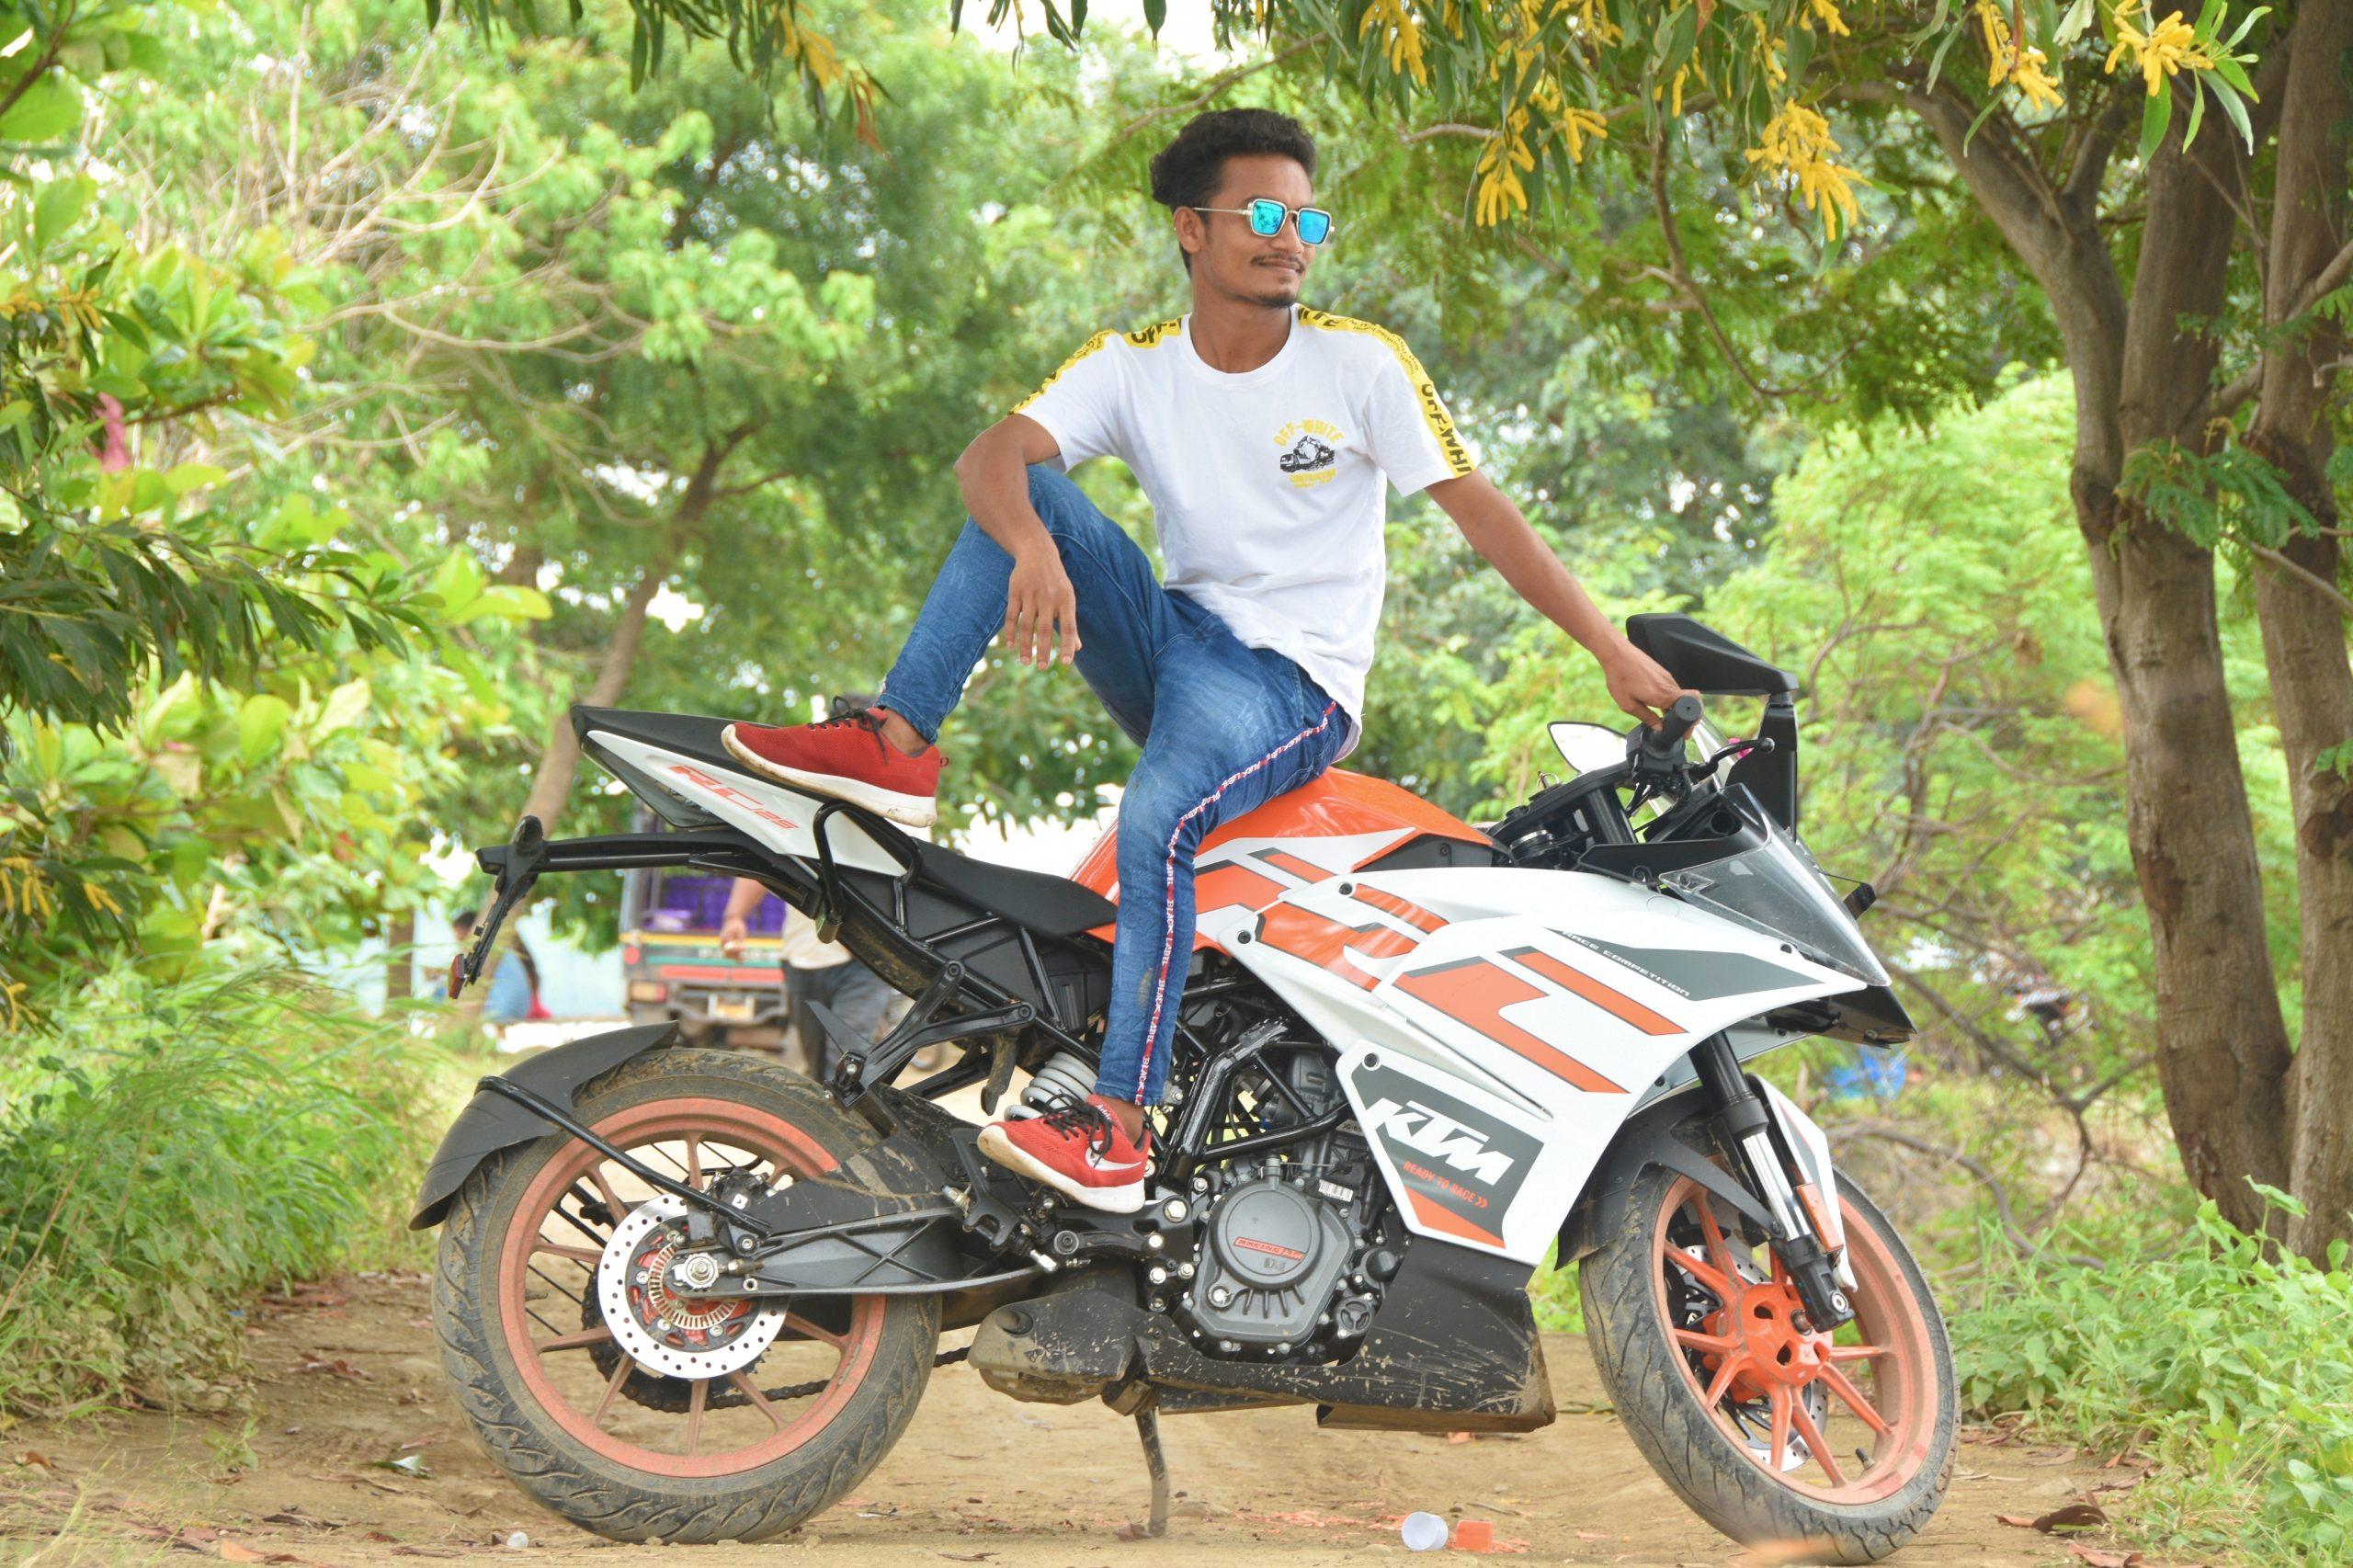 Boy sitting over bike and posing